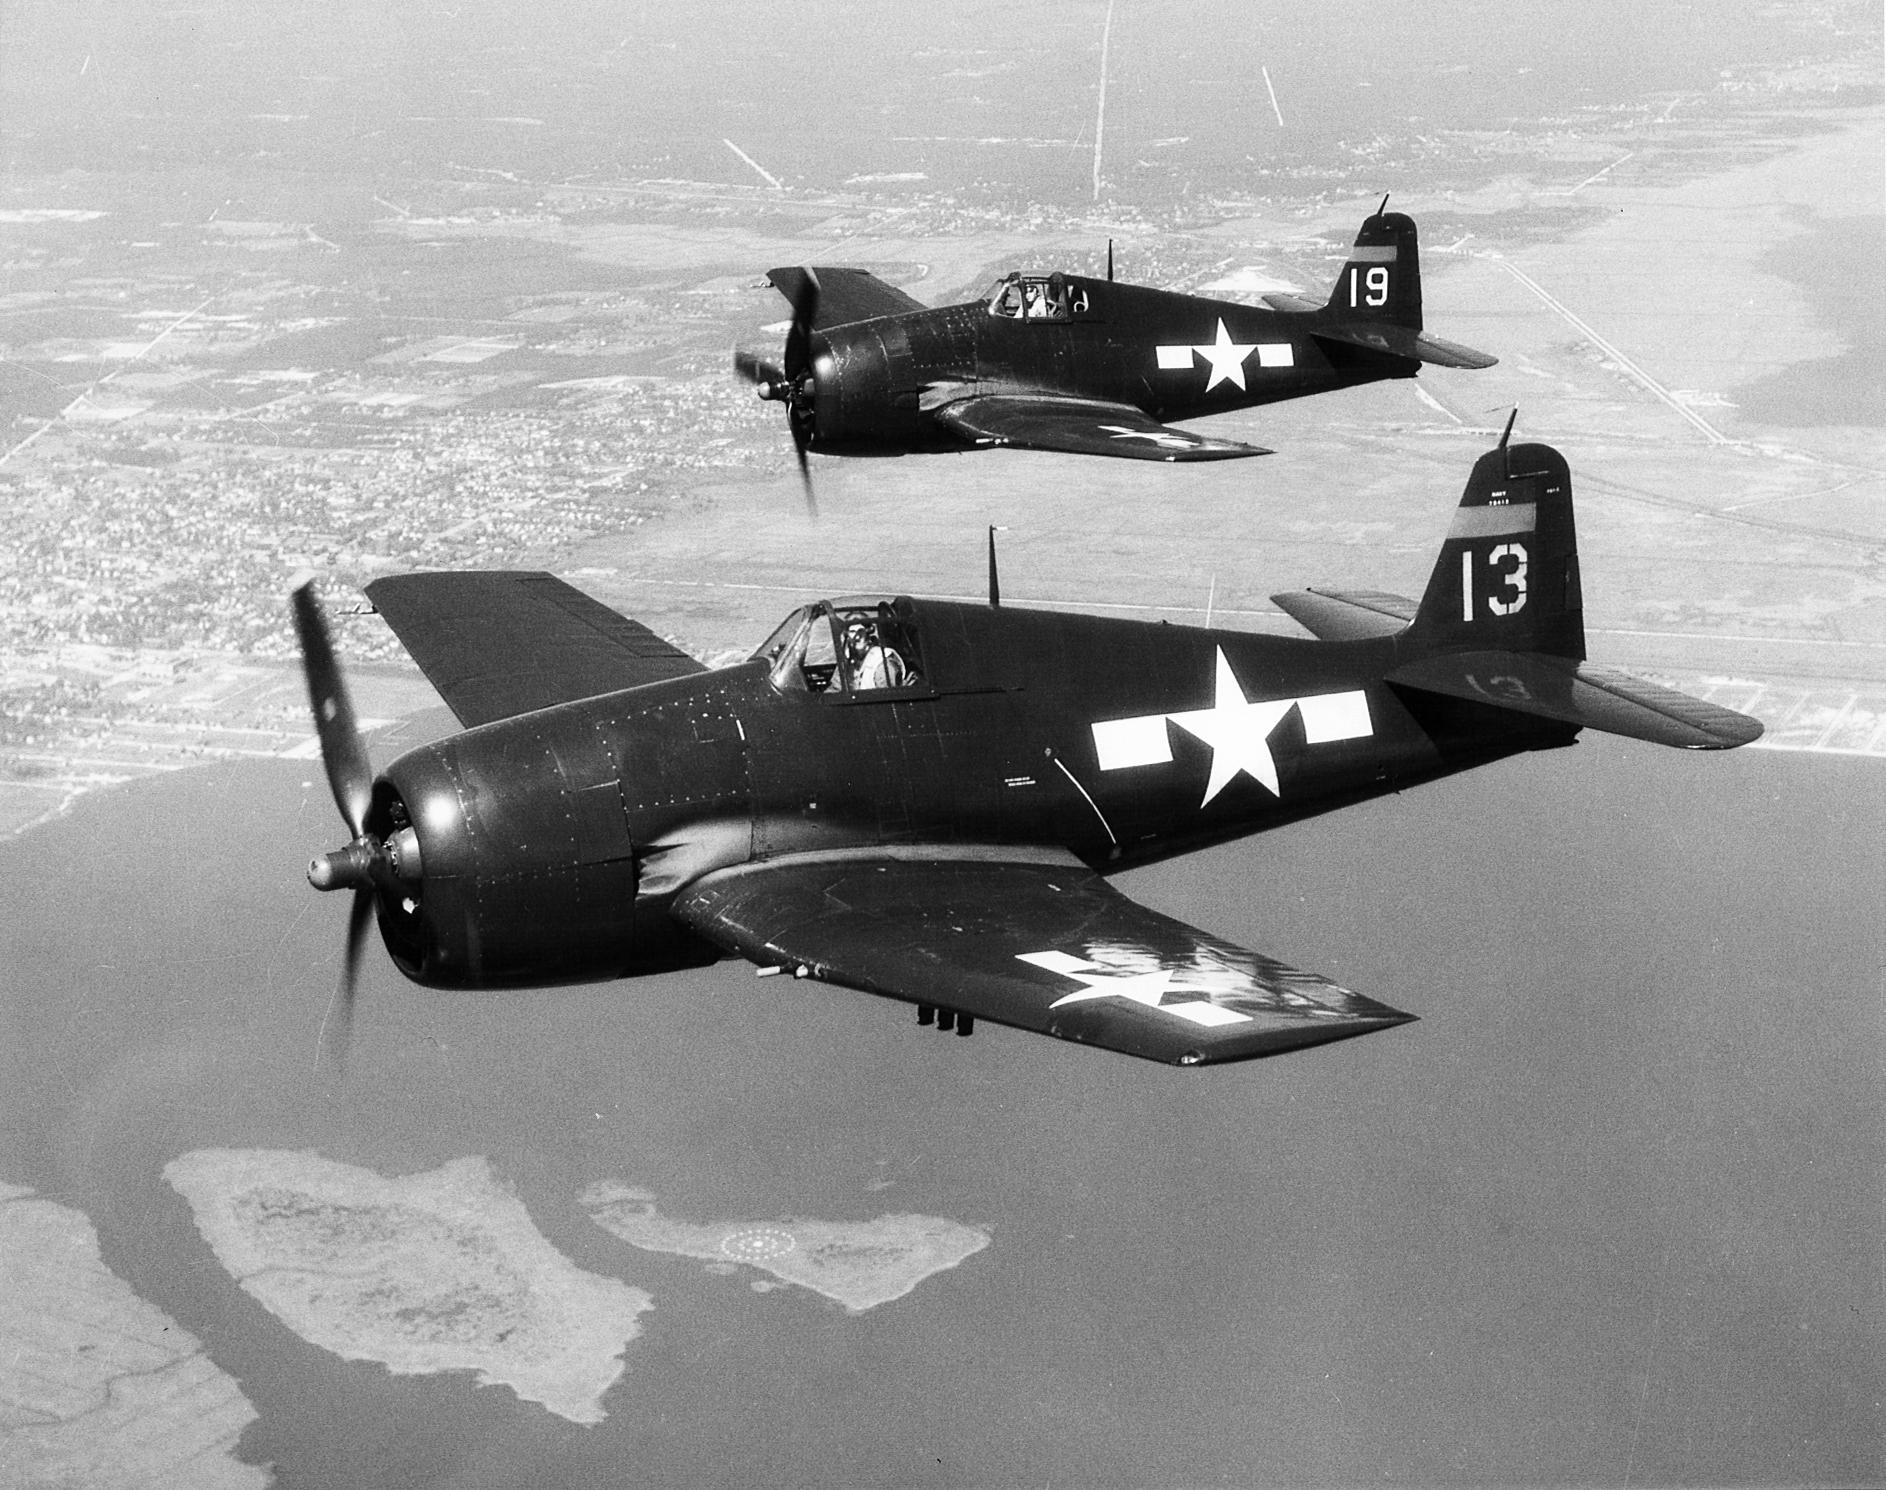 Grumman F6F 5 Hellcat VF 75 White 13 and 19 flying near Atlantic City NJ 01